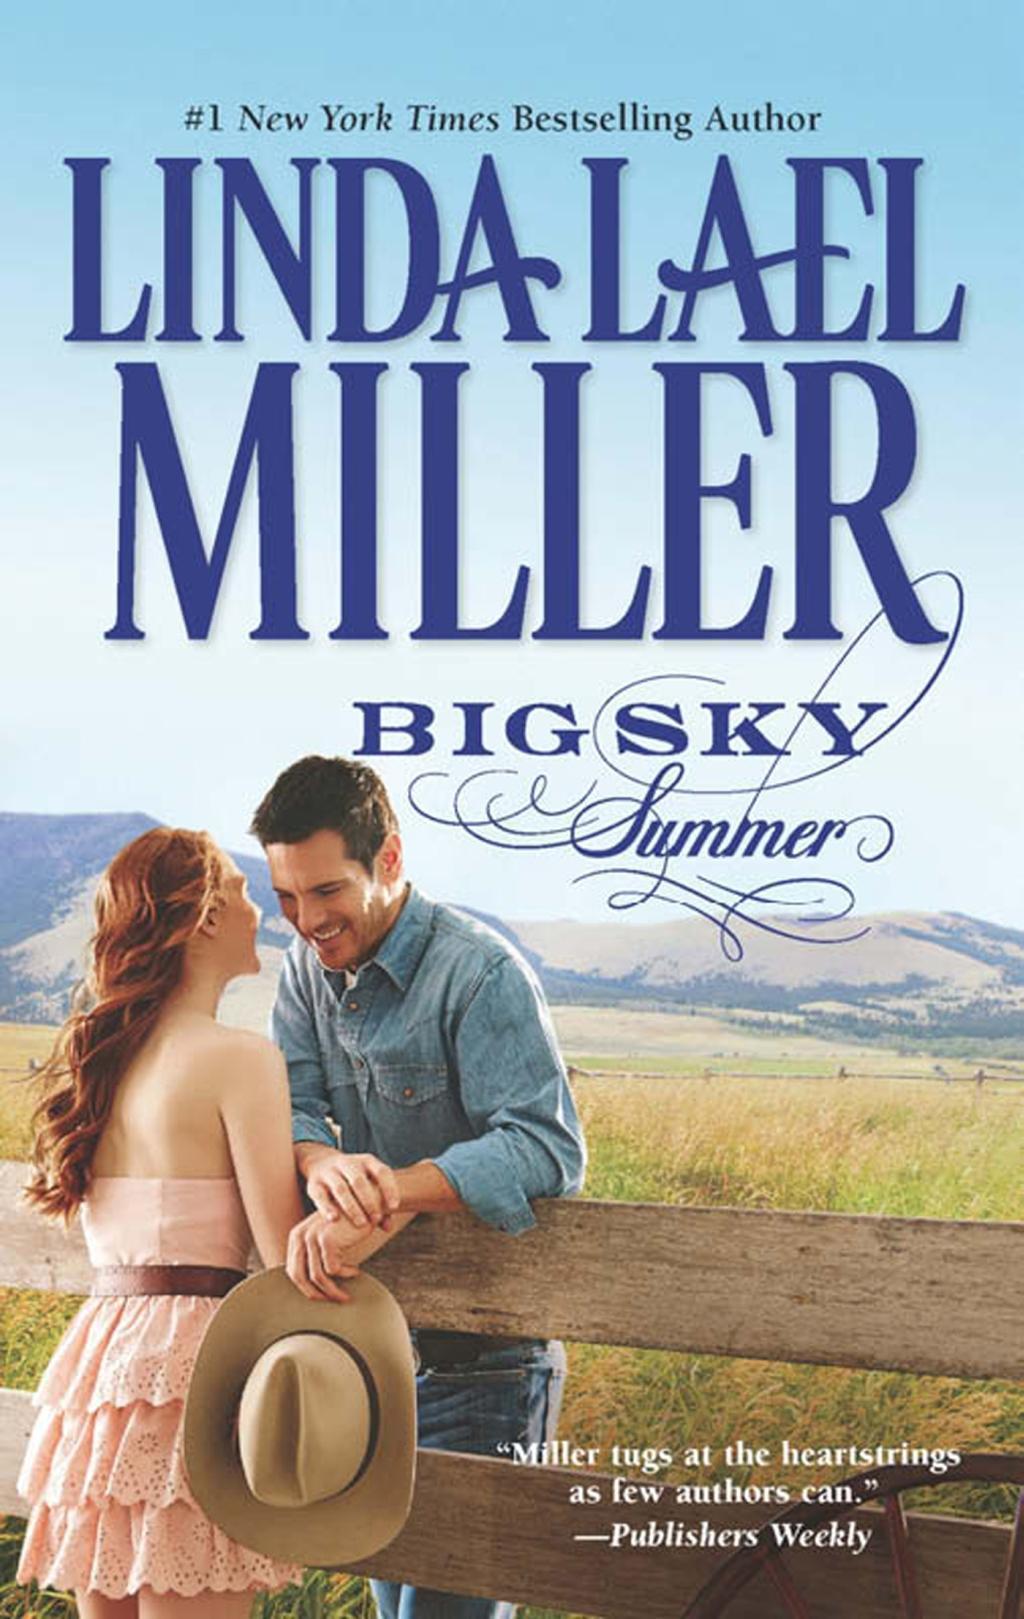 Big Sky Summer (Mills & Boon M&B)